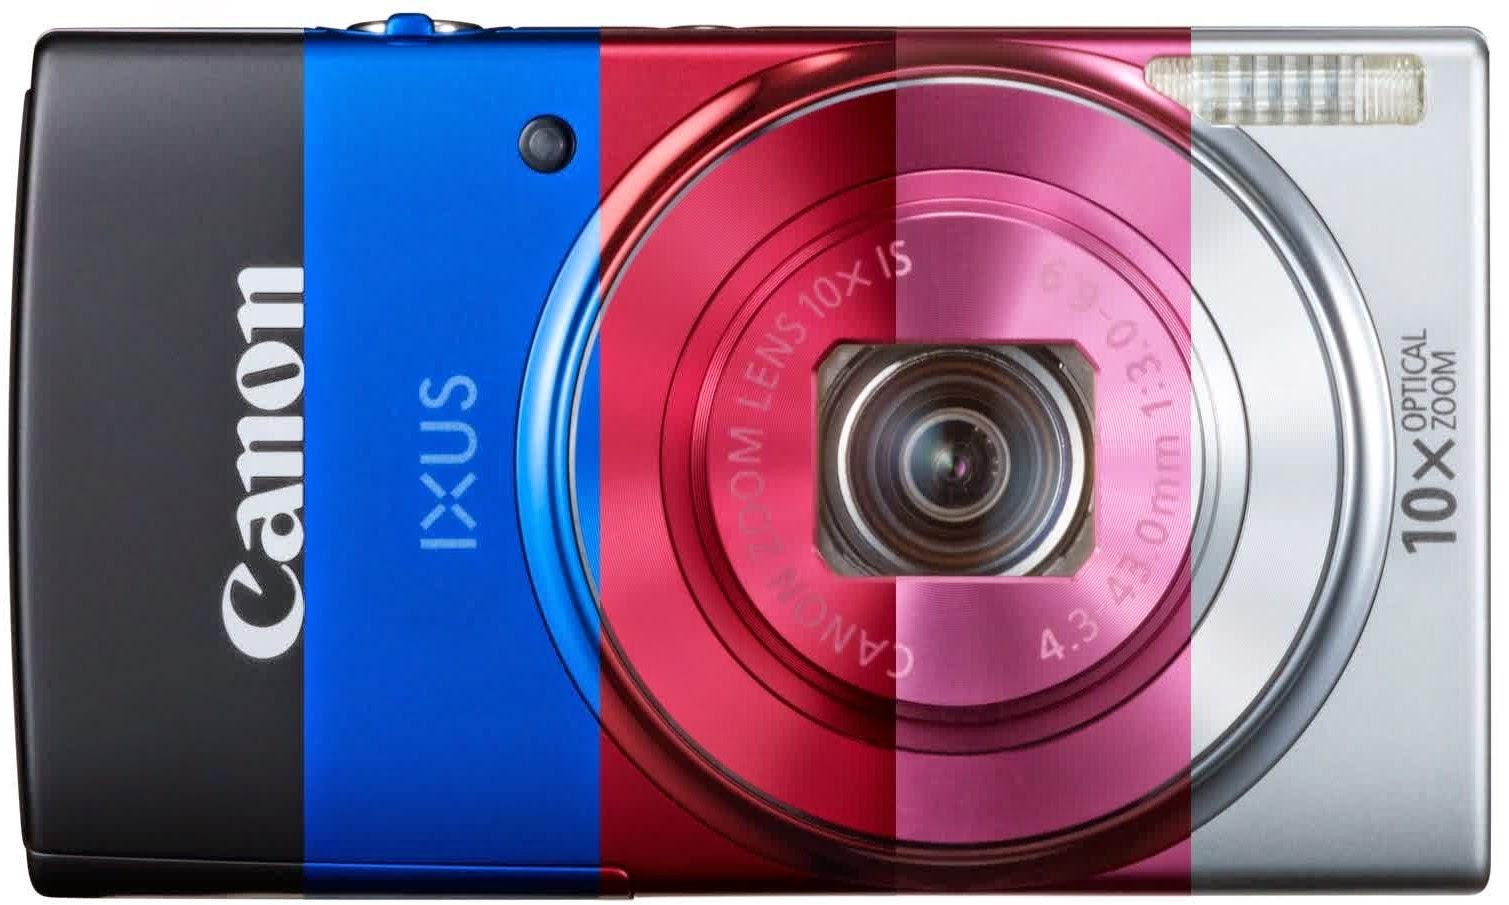 Harga dan Spesifikasi Canon Digital IXUS 155 Terbaru